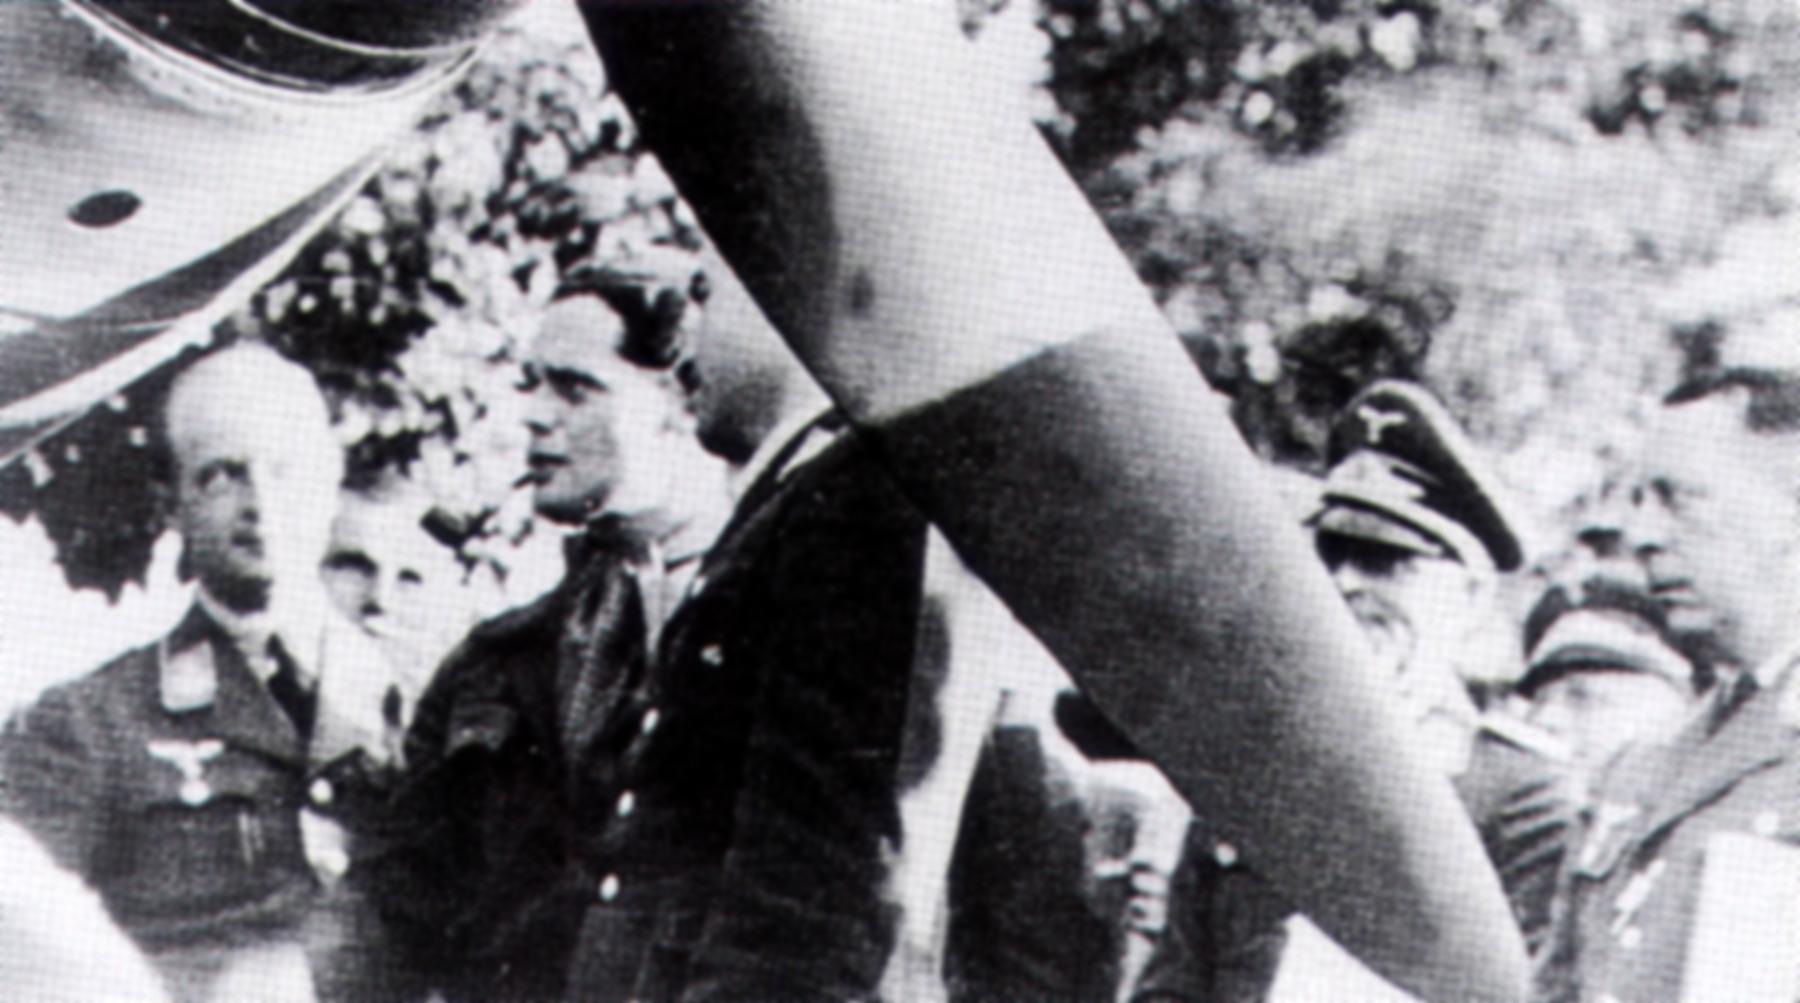 Aircrew RAF Douglas Bader with Adolf Galland Aug 9 1941 02